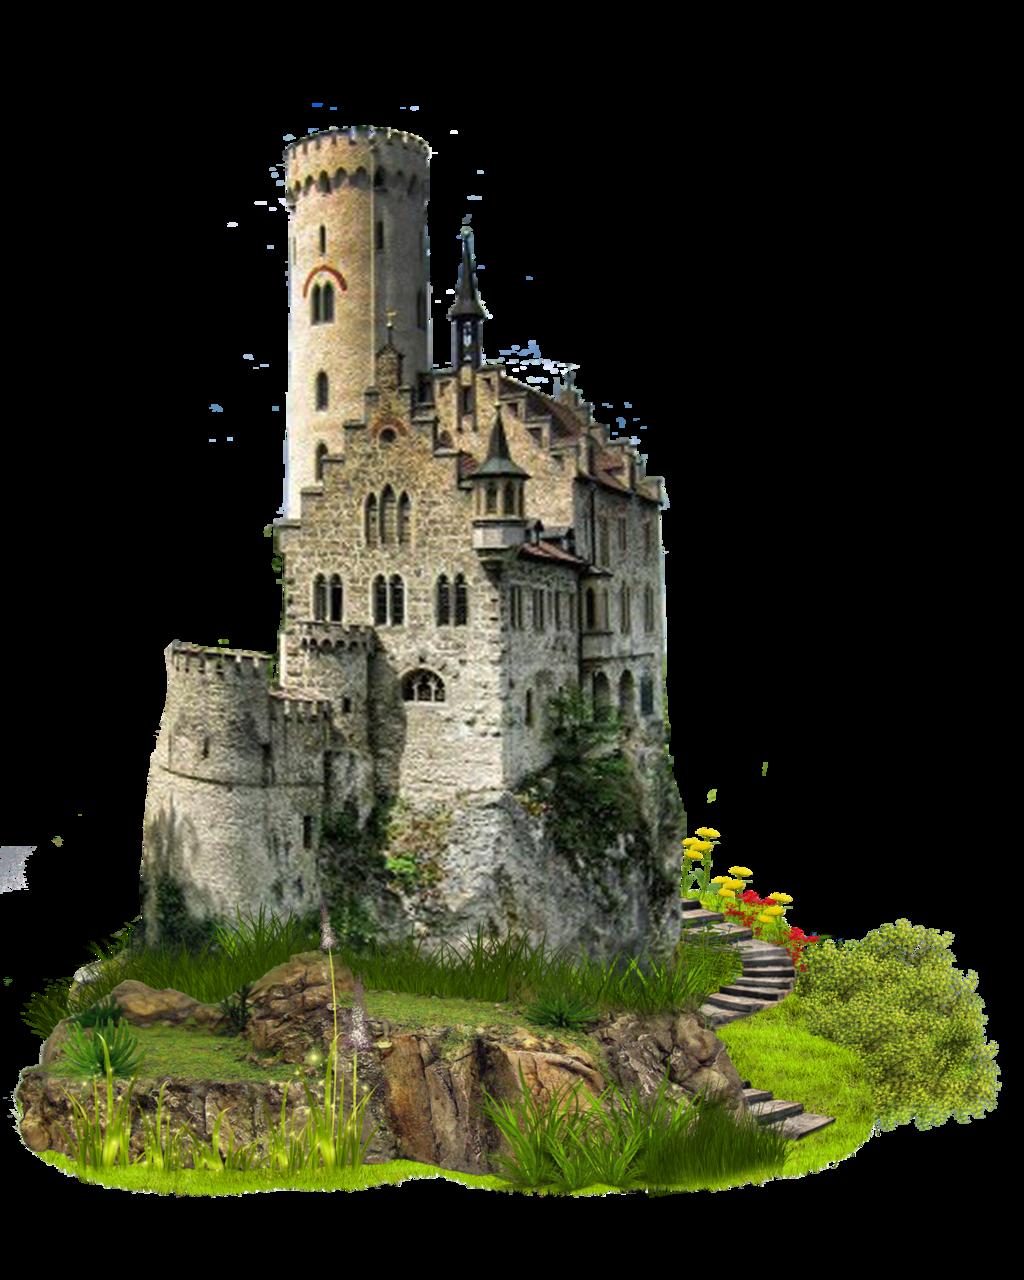 Artist Impression of a Castle